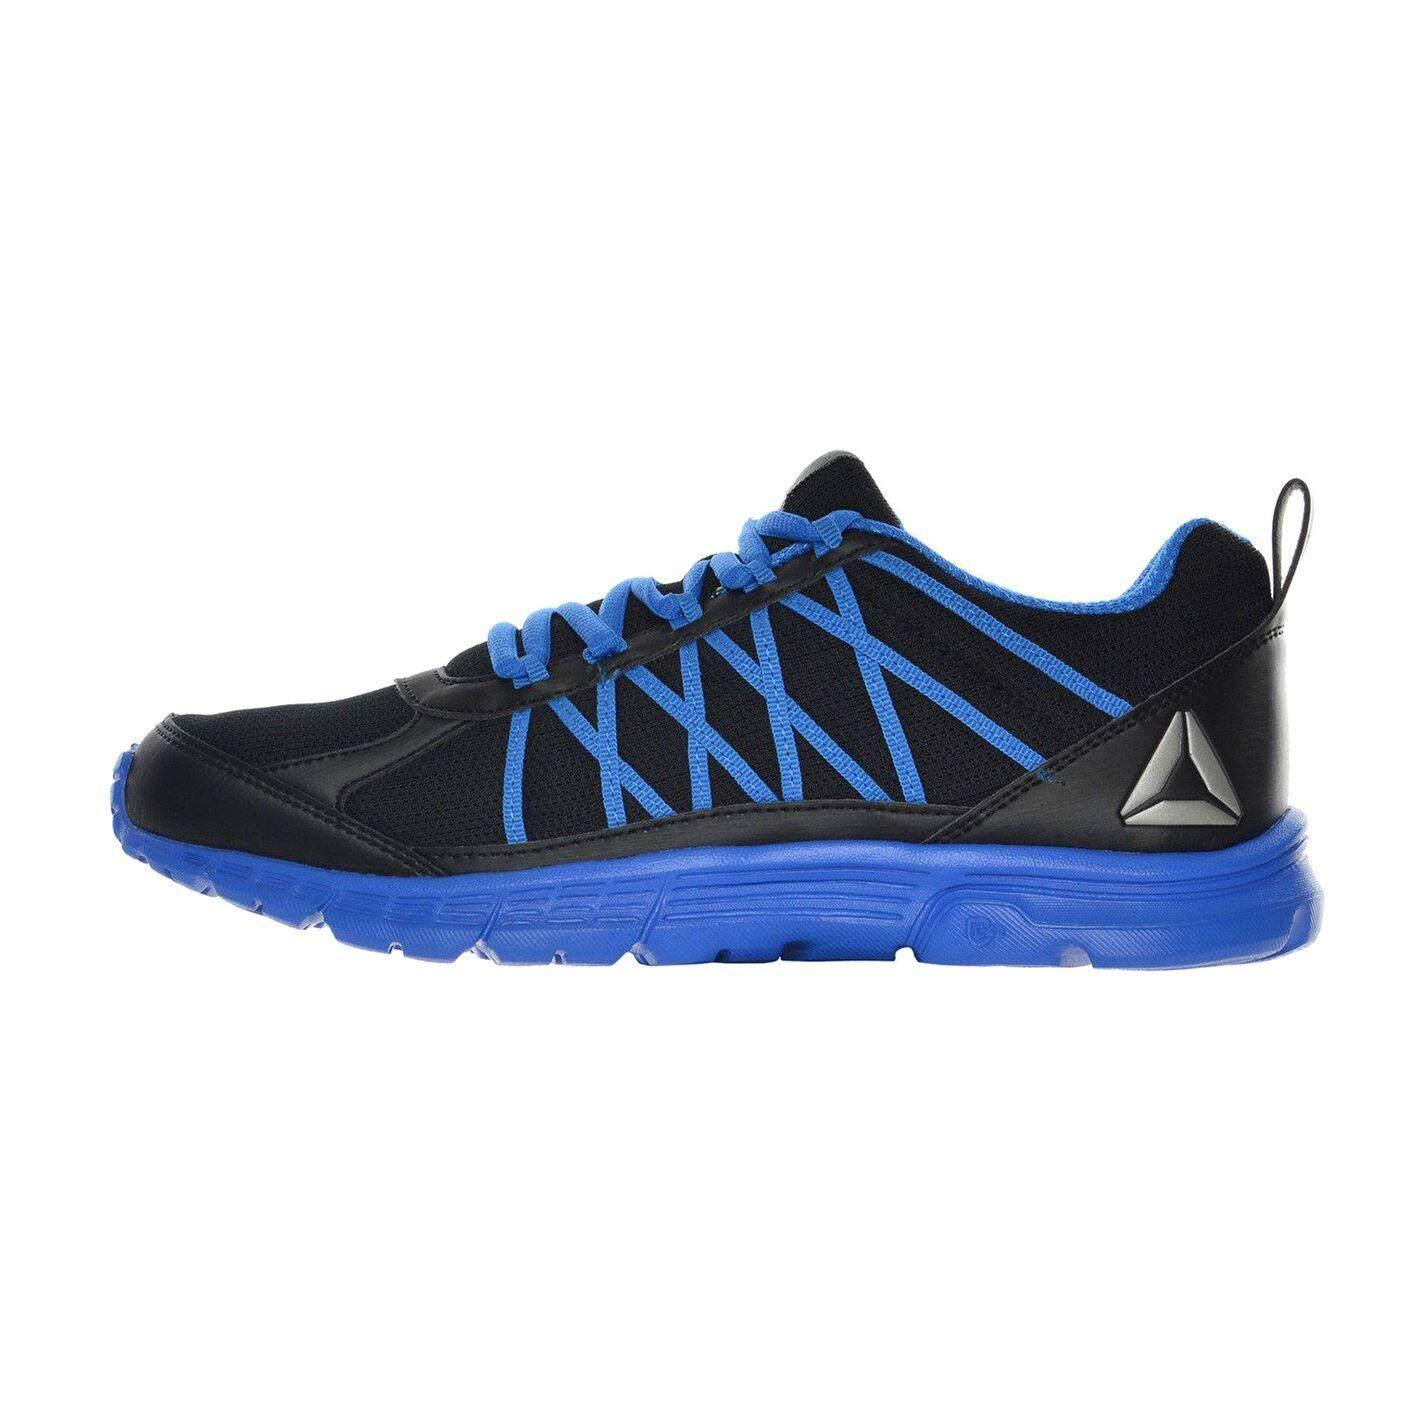 Reebok Mens Speedlux 2.0 Running Shoes (Black/Blue)